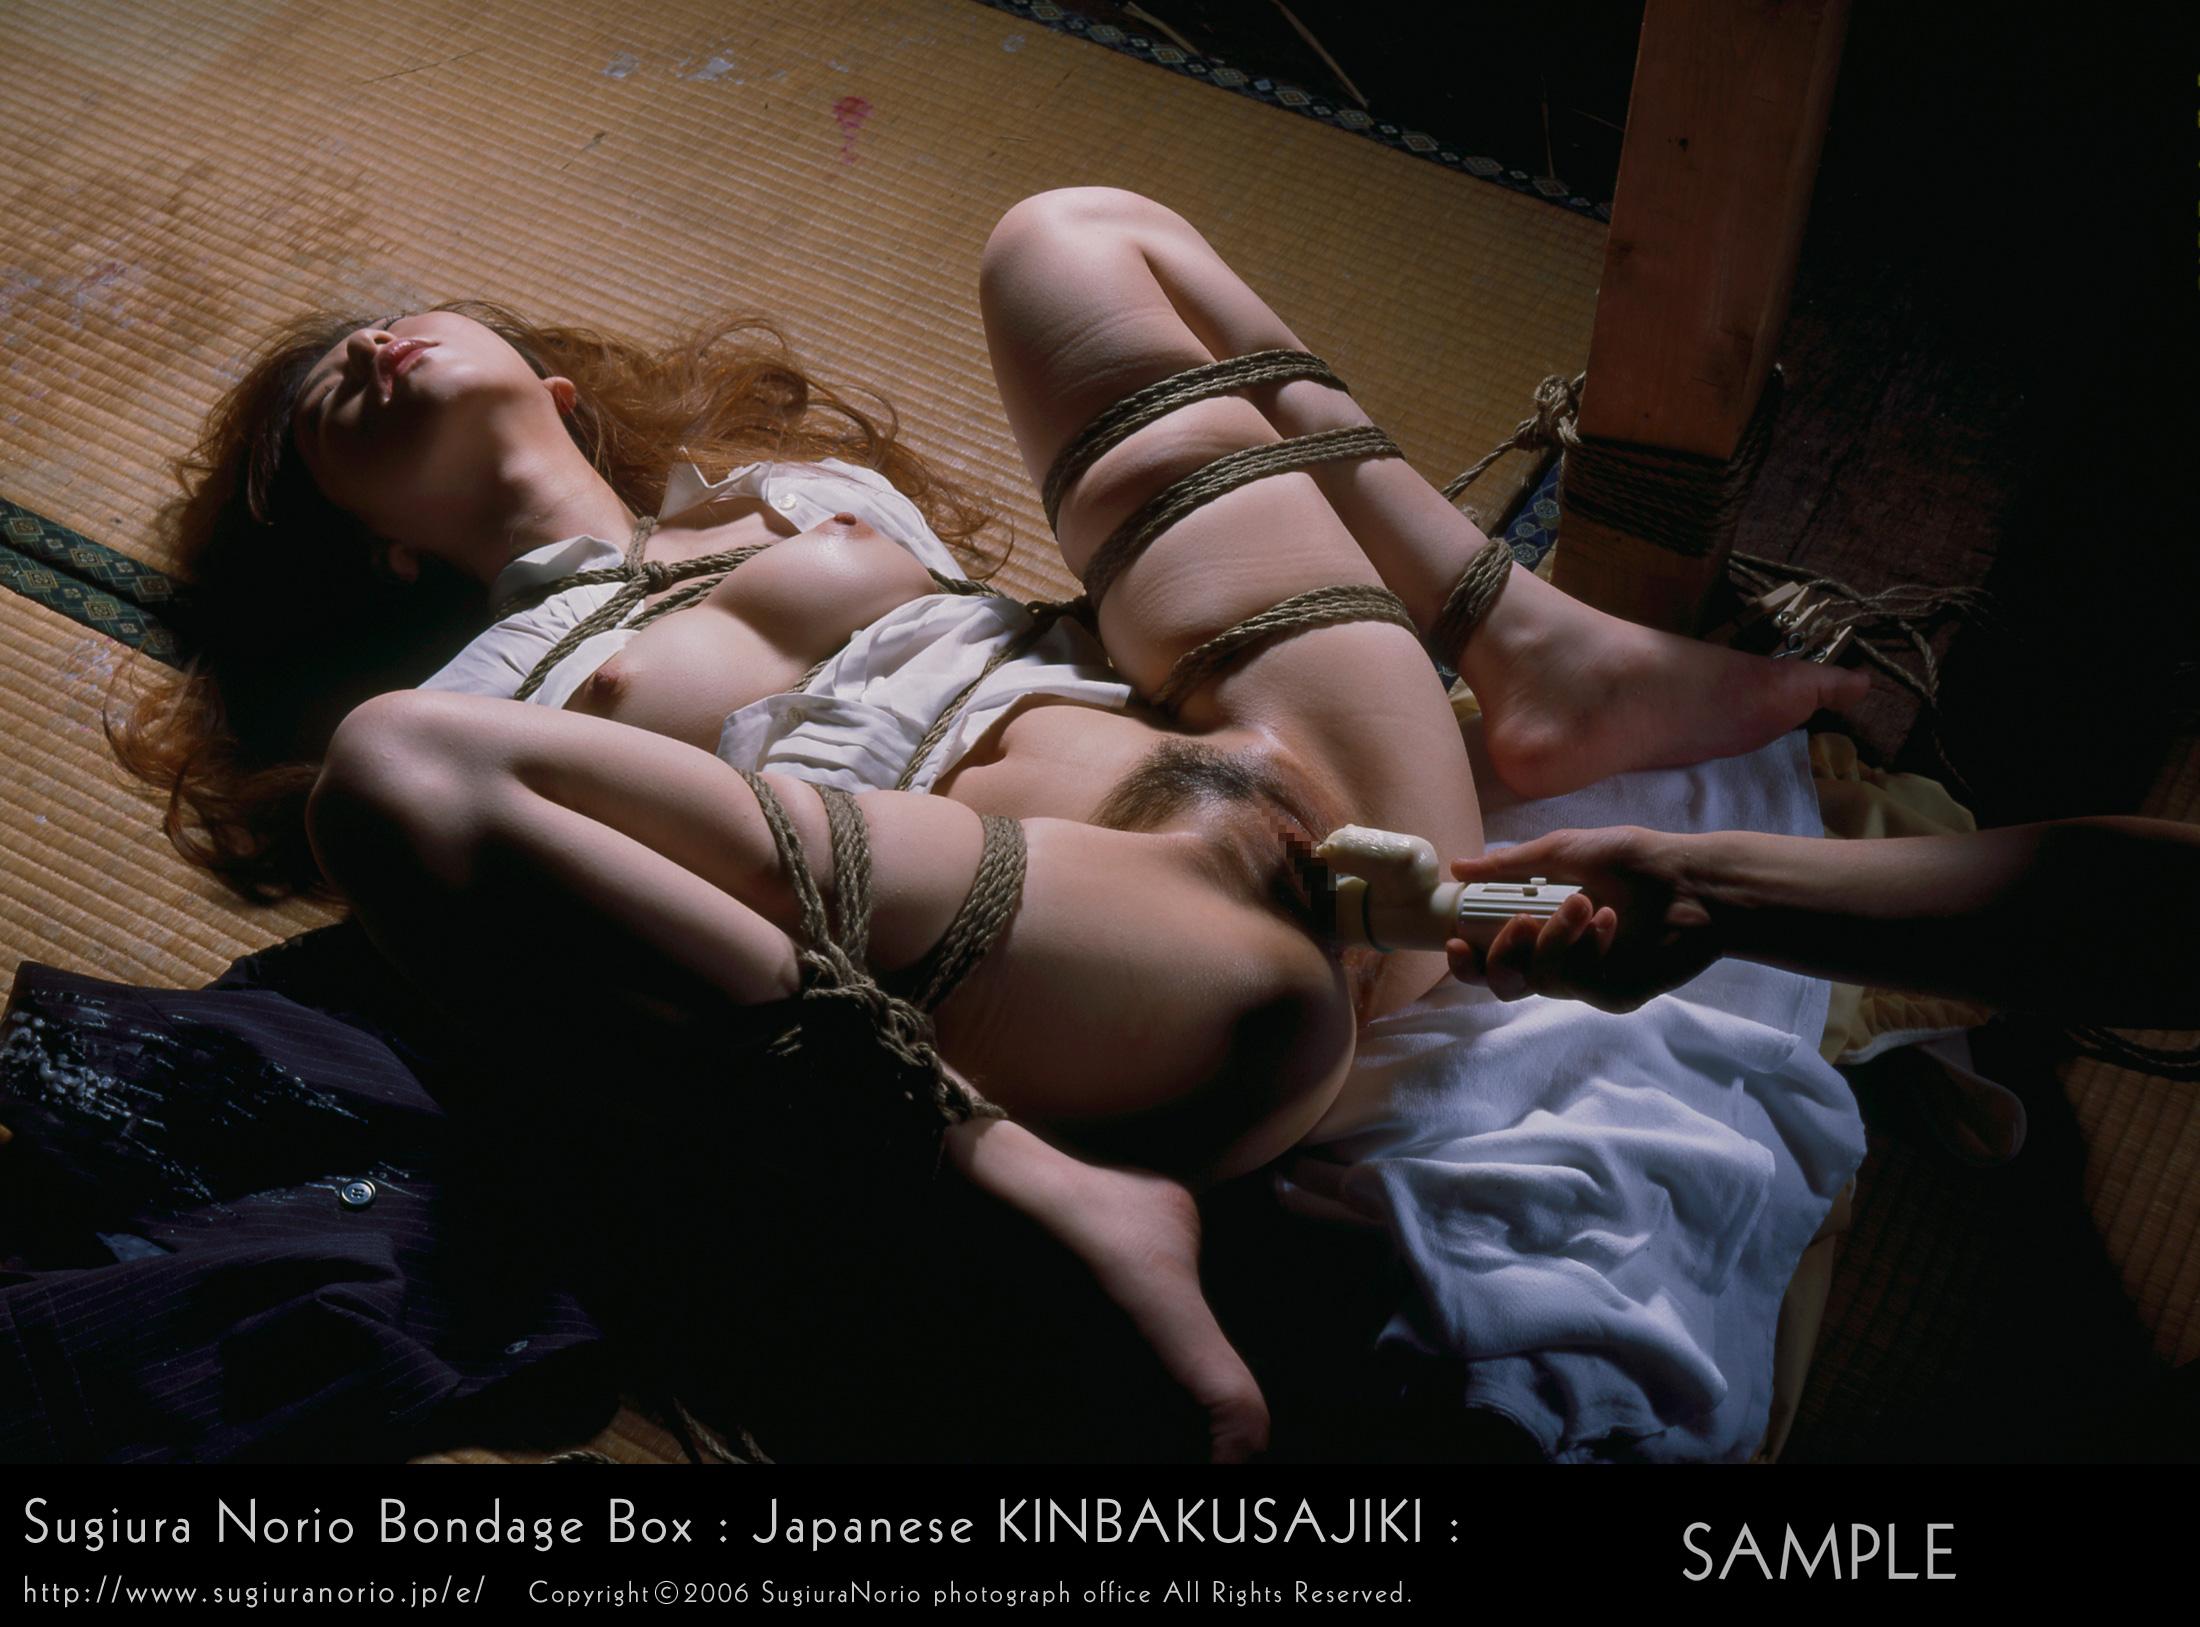 kinbakusajiki Japanese bondage Sugiura Norio